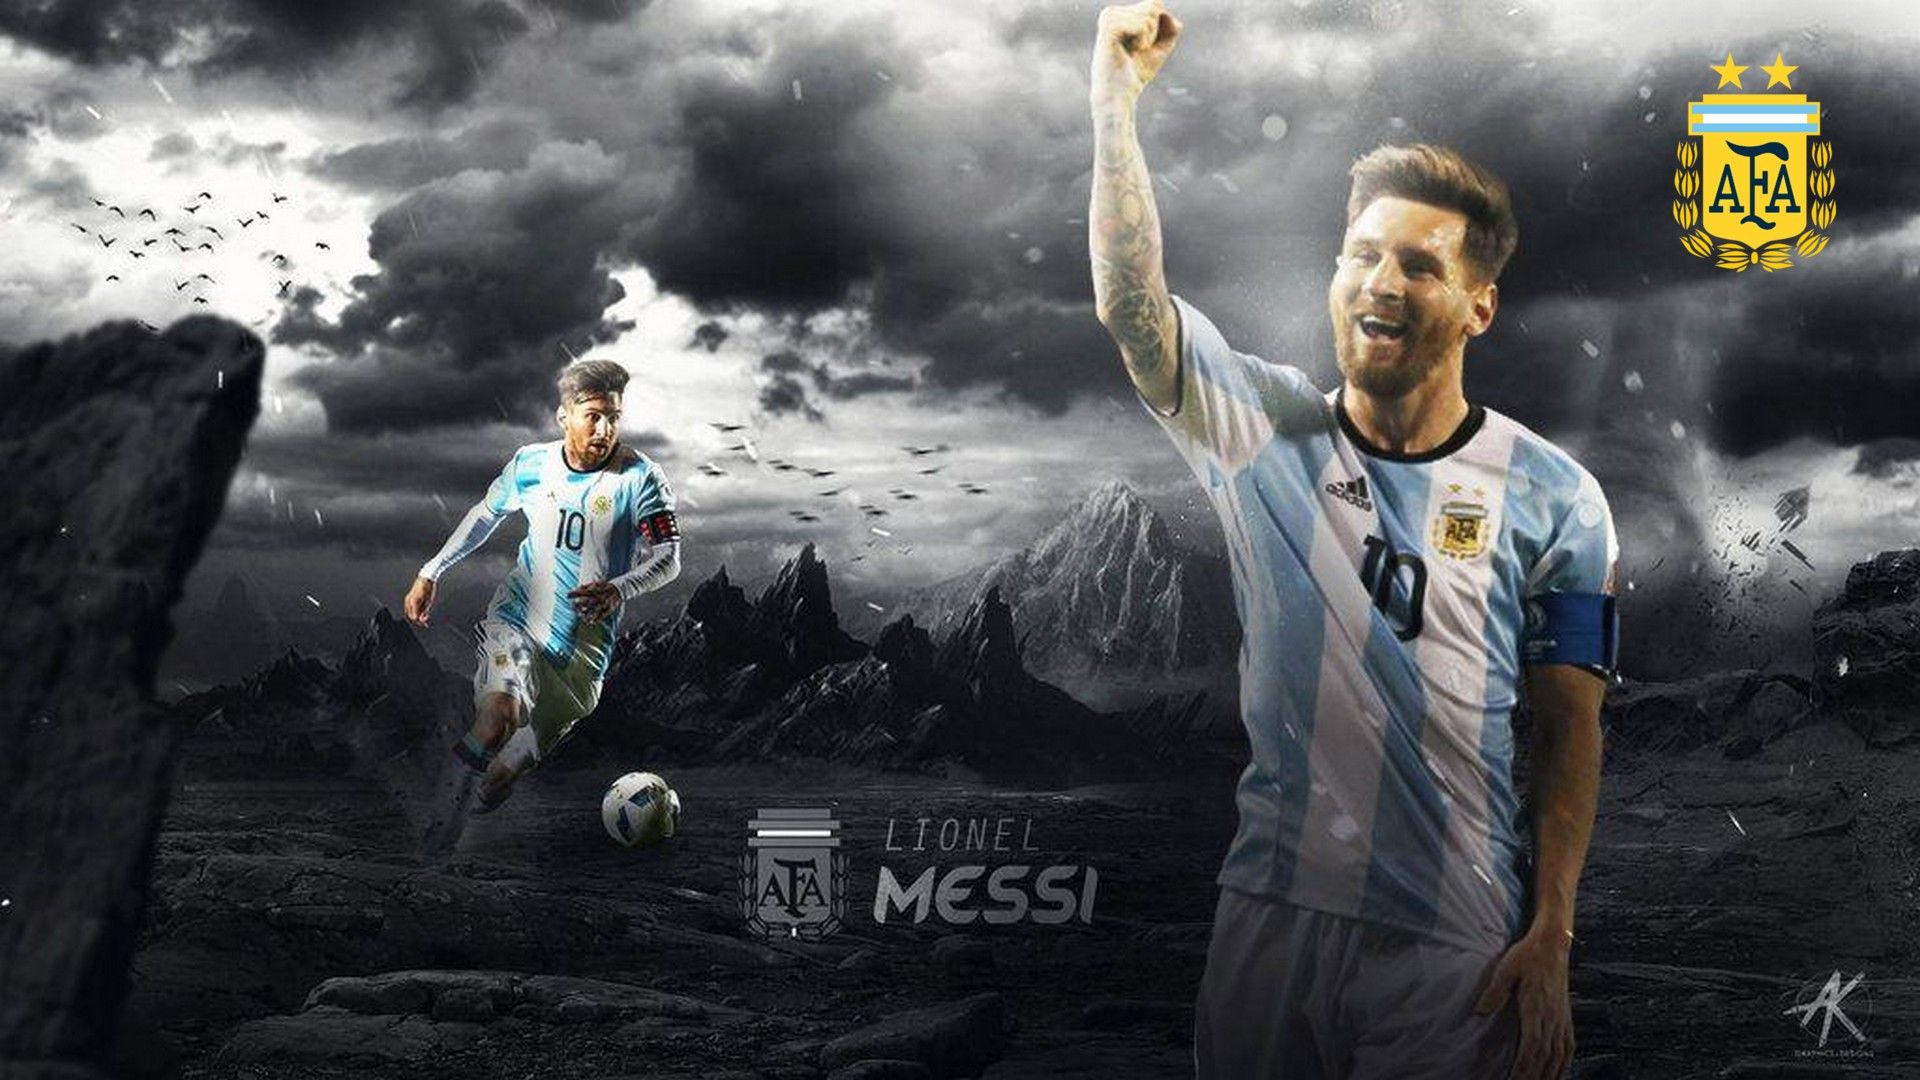 Wallpapers Hd Messi Argentina Messi Messi Argentina Football Wallpaper